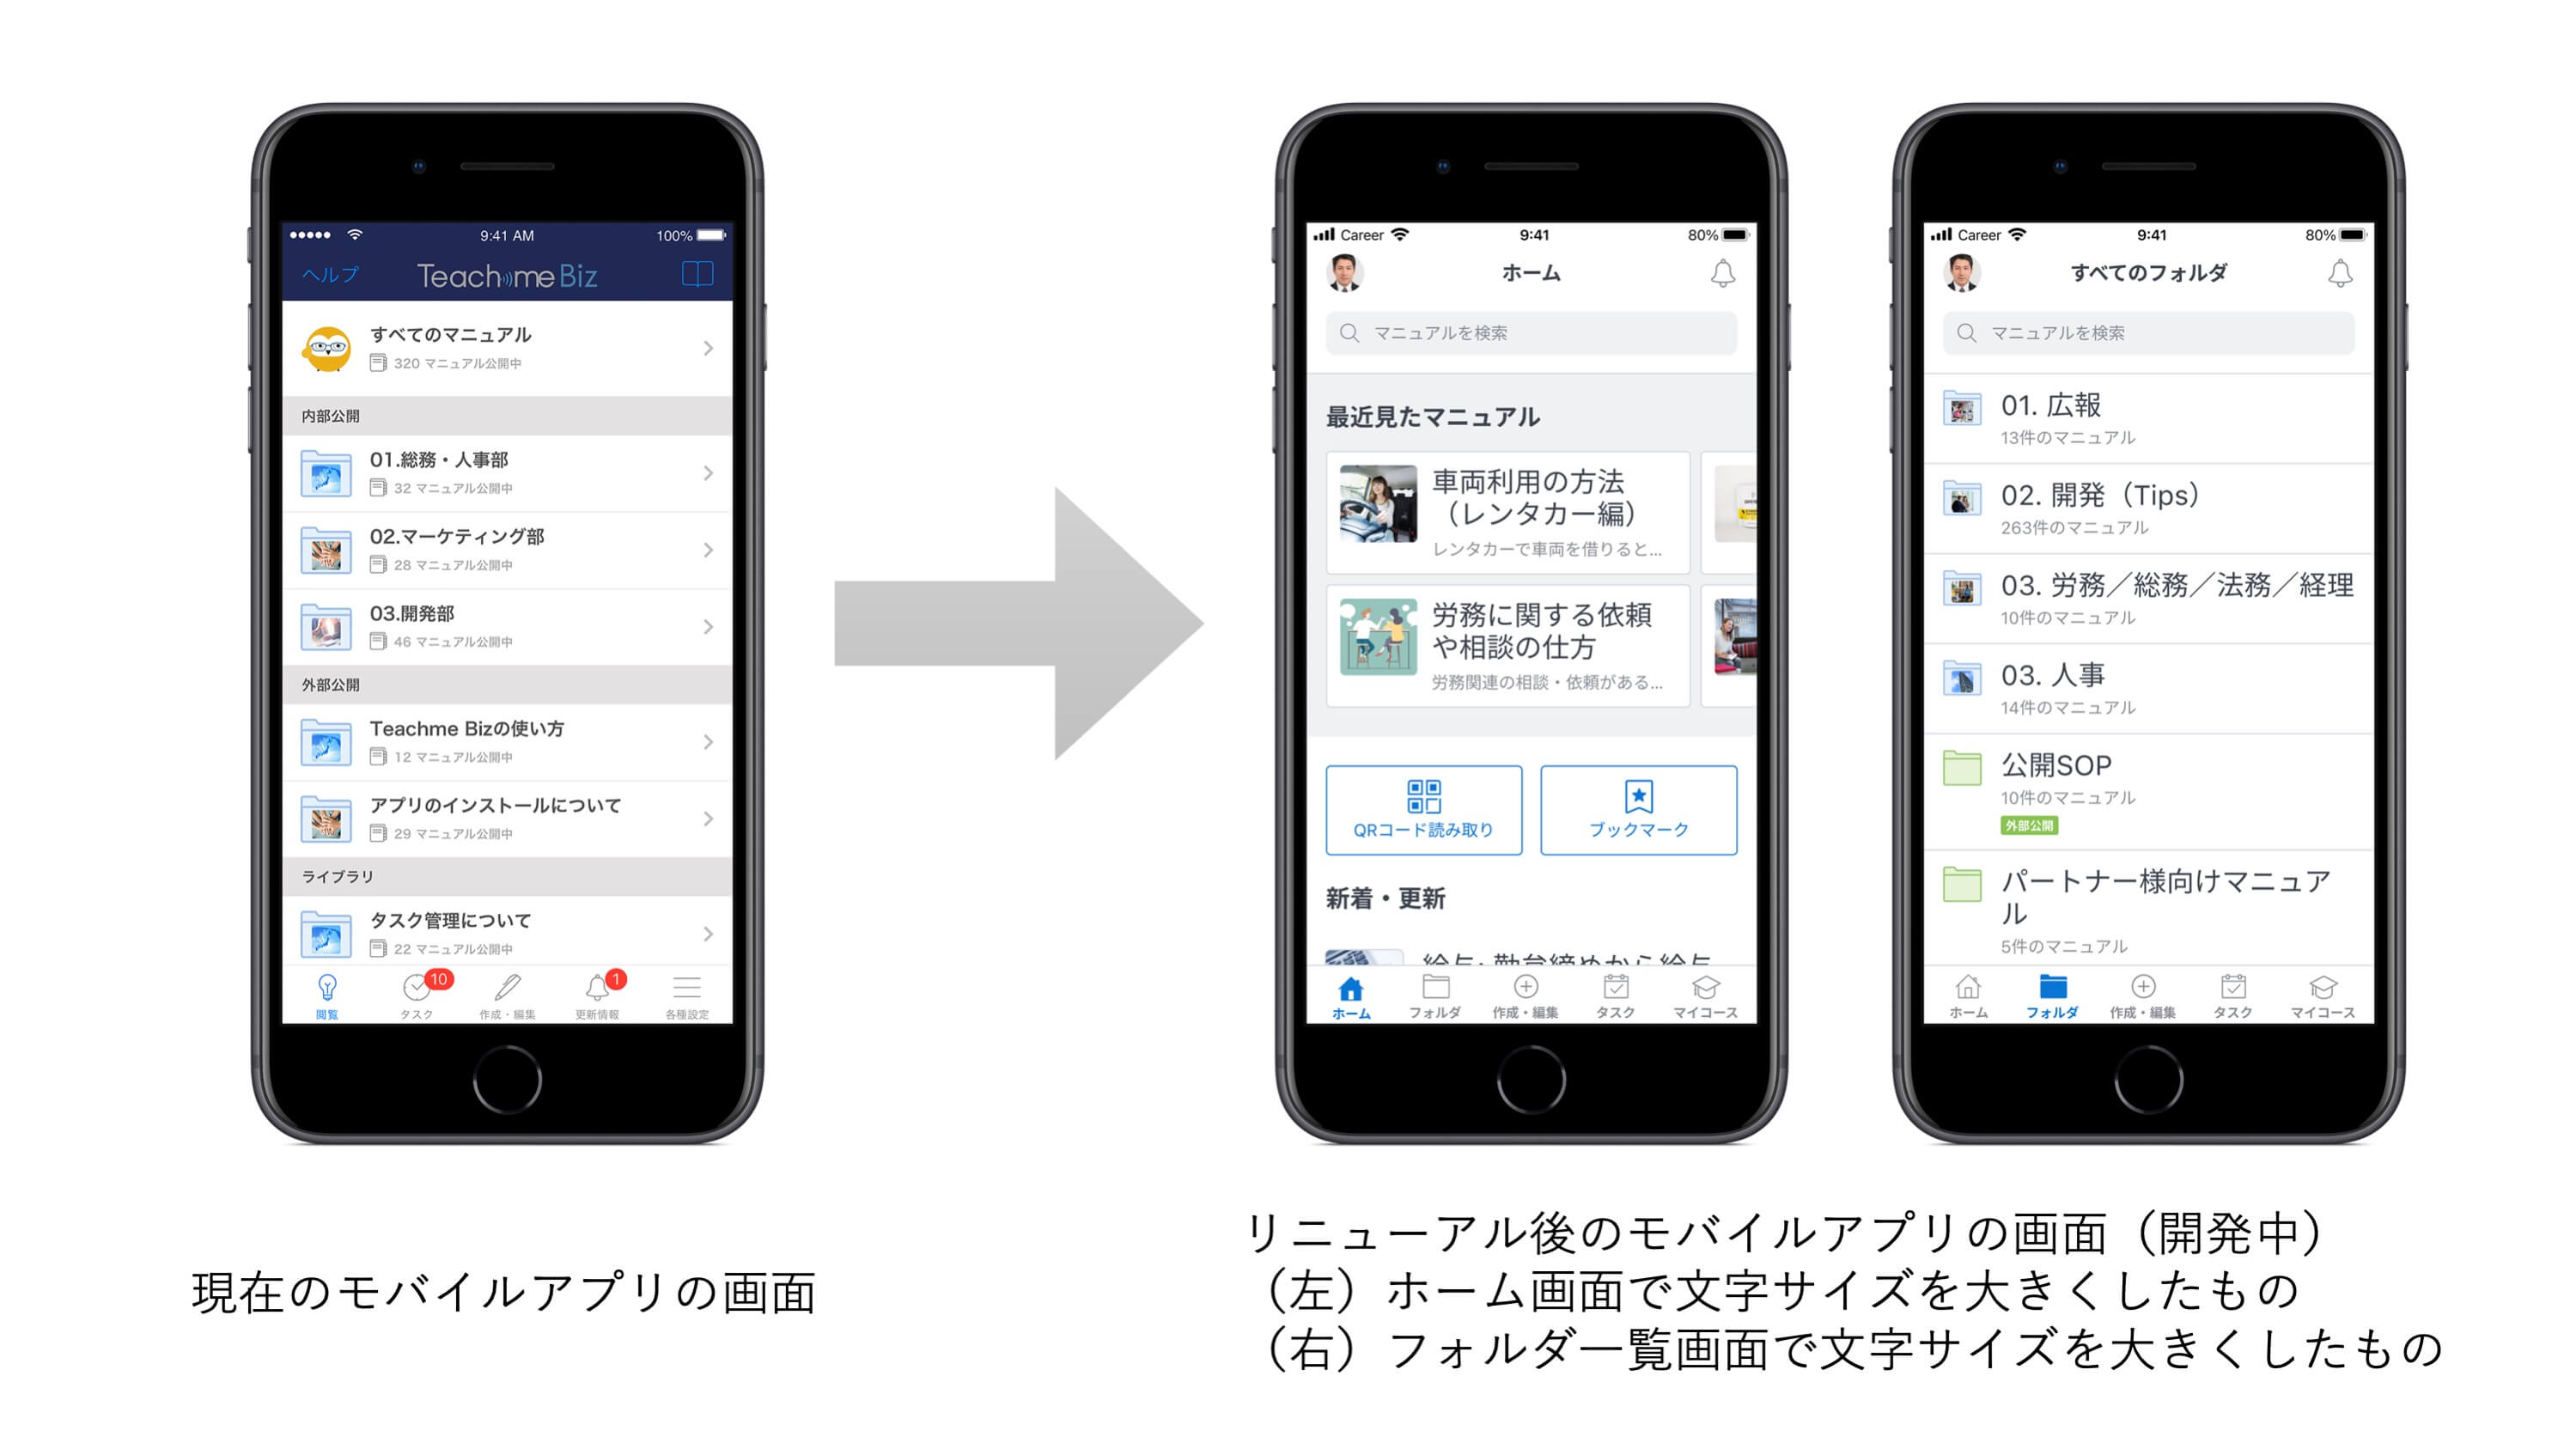 Teachme BizモバイルアプリのUI変更前と変更後の画像